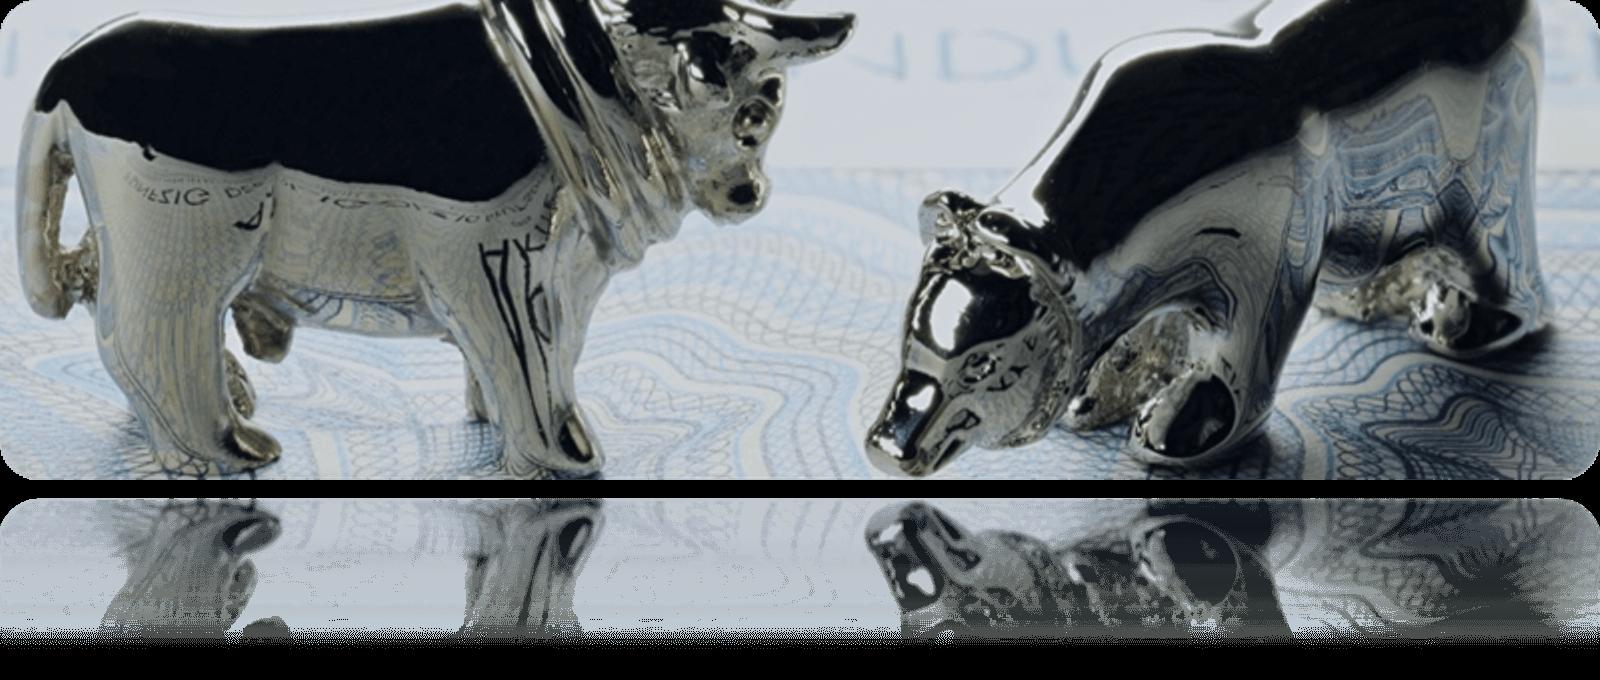 Wertpapierdepot Vermögen Depotmanagement